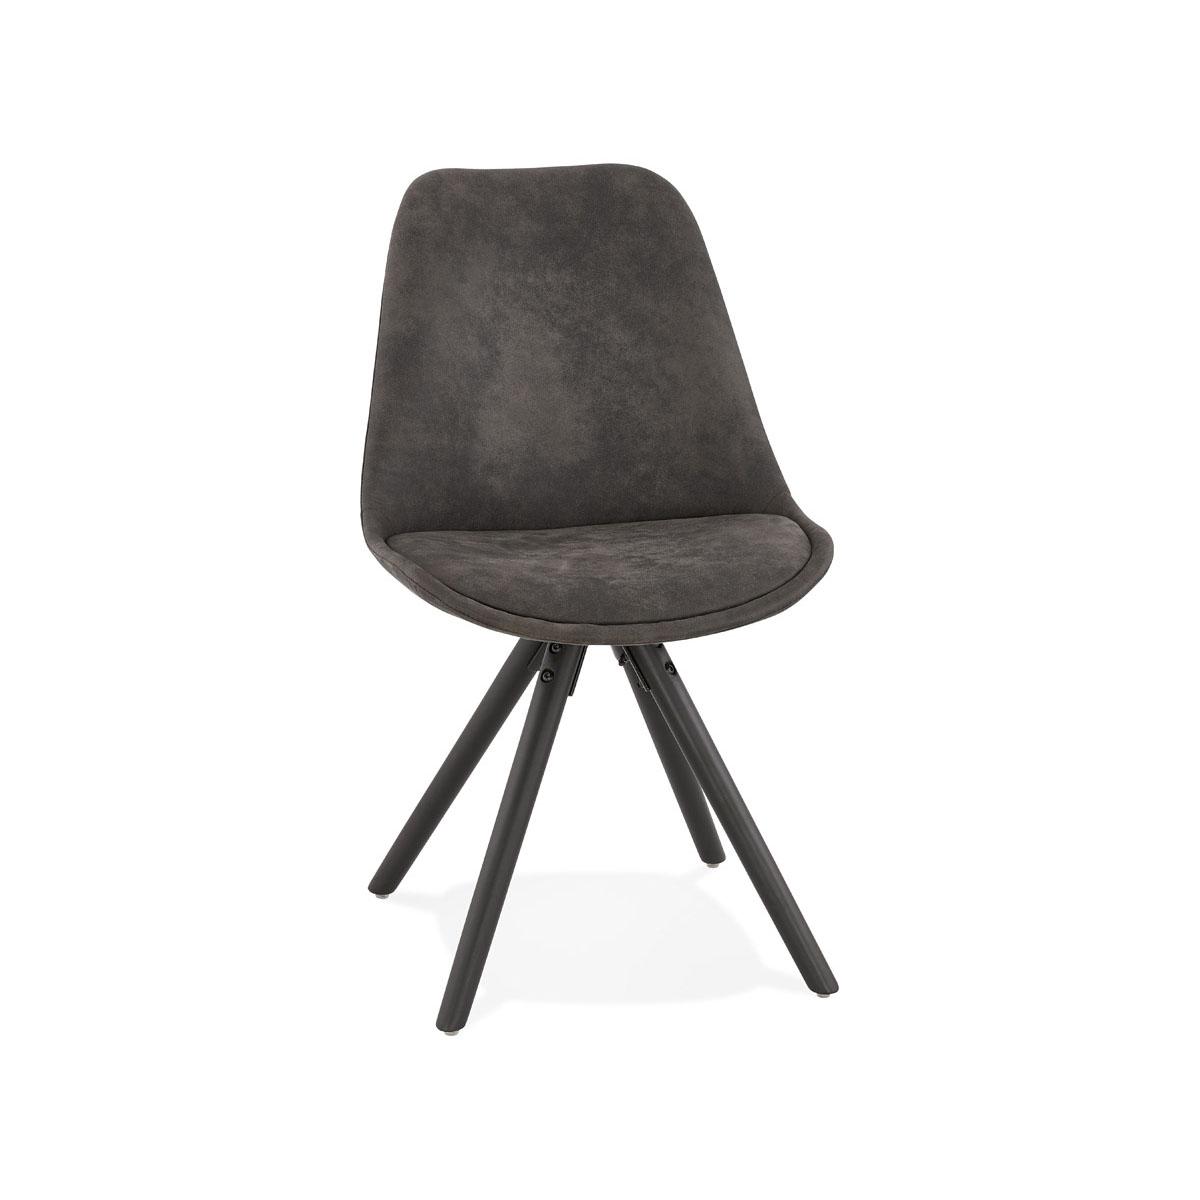 Krzesło Kokoon Design Charlie ciemnoszare nogi czarne